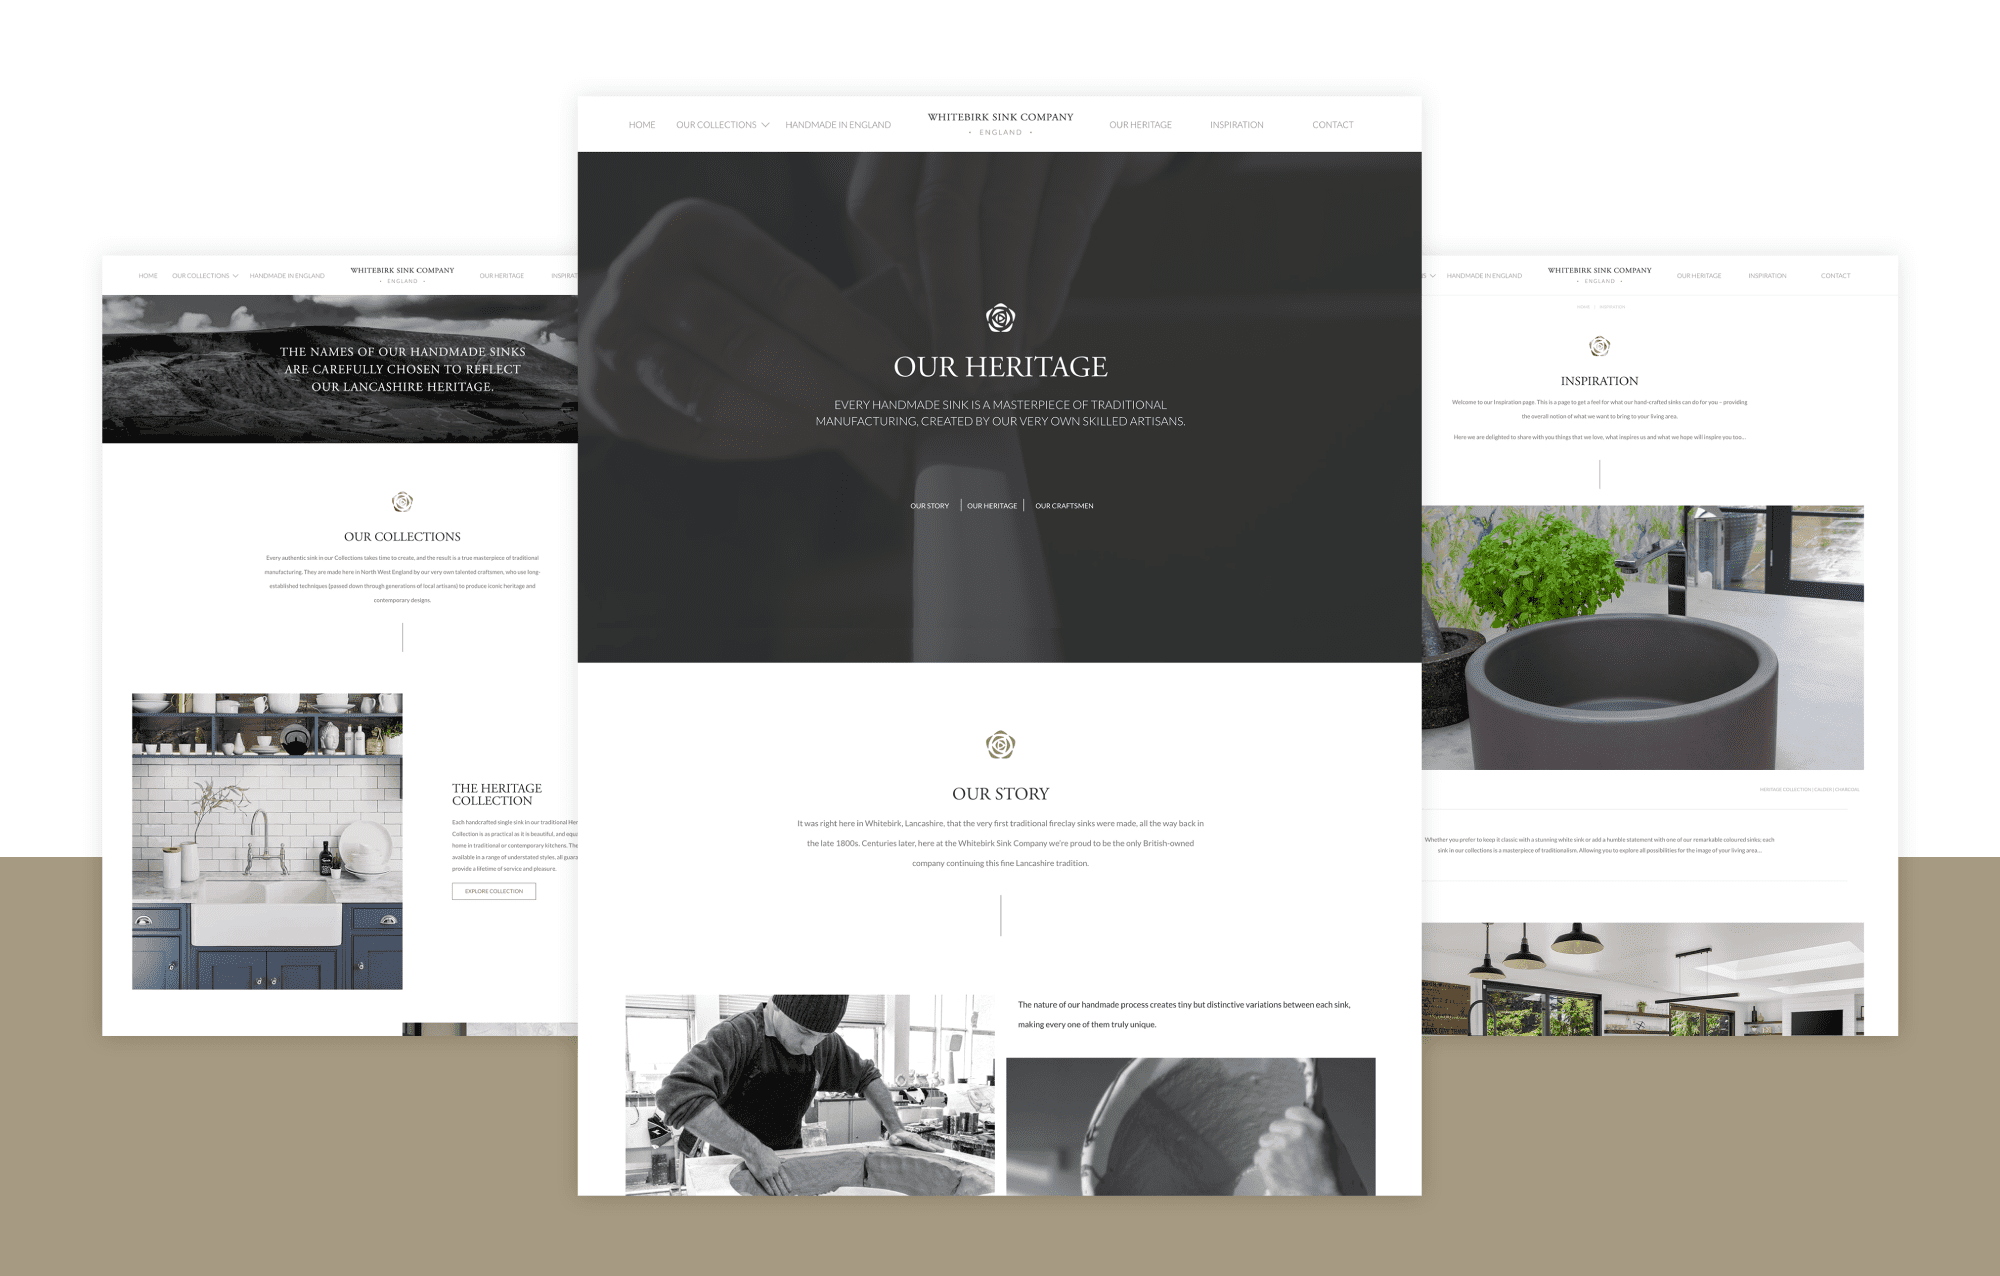 Whitebirk Sink Company - Website Design